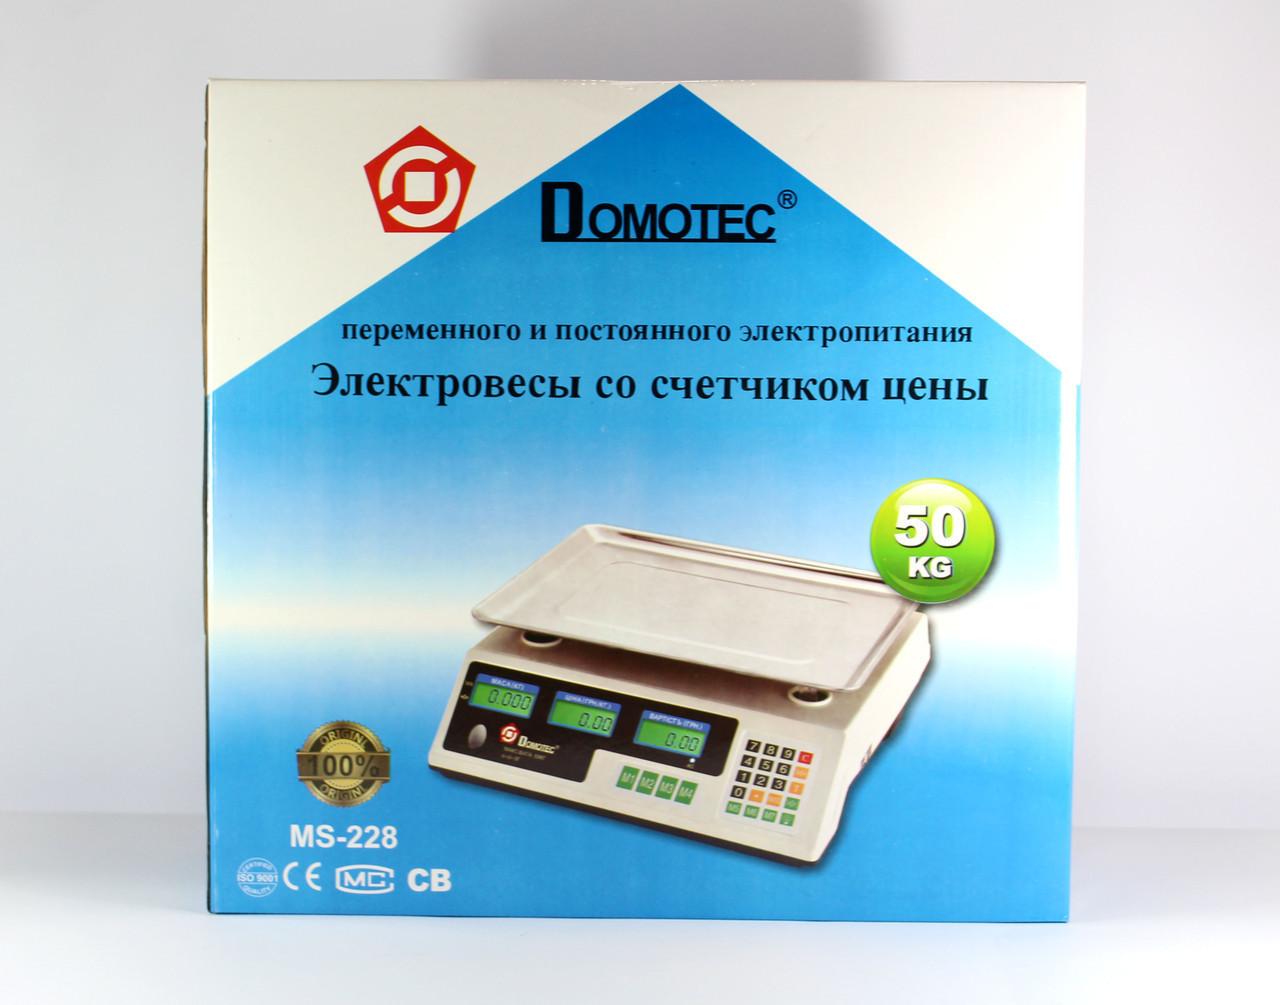 Весы ACS 50kg/5g MS 228 Domotec/ 983    6V